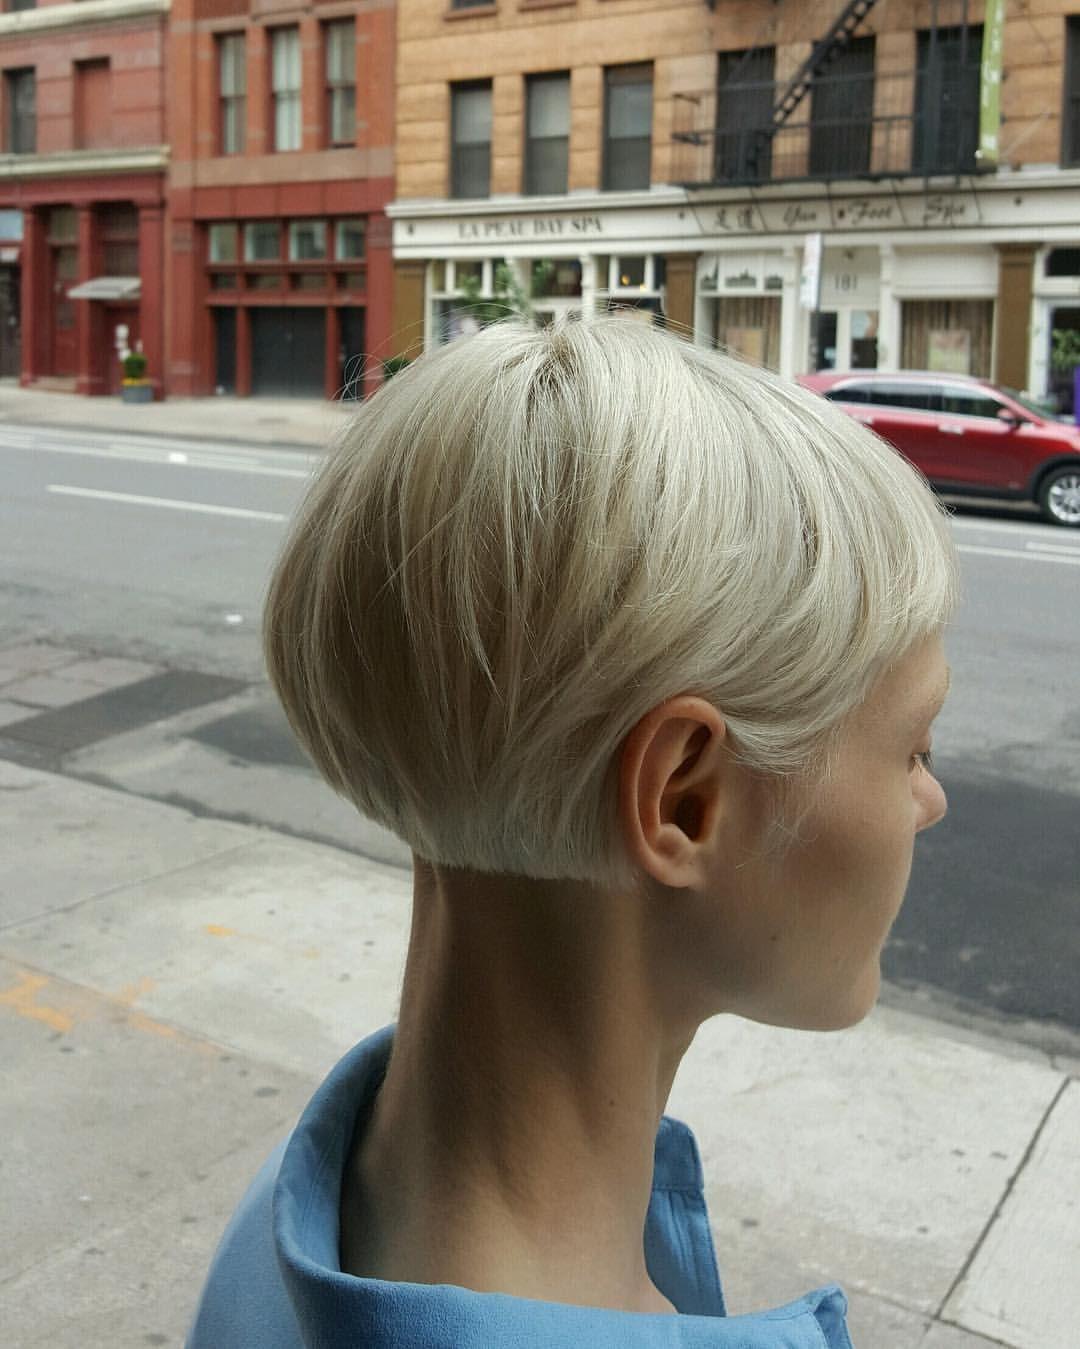 Step cutting hairstyle boy  gillamarkeringar  kommentarer  nora vai noravai på